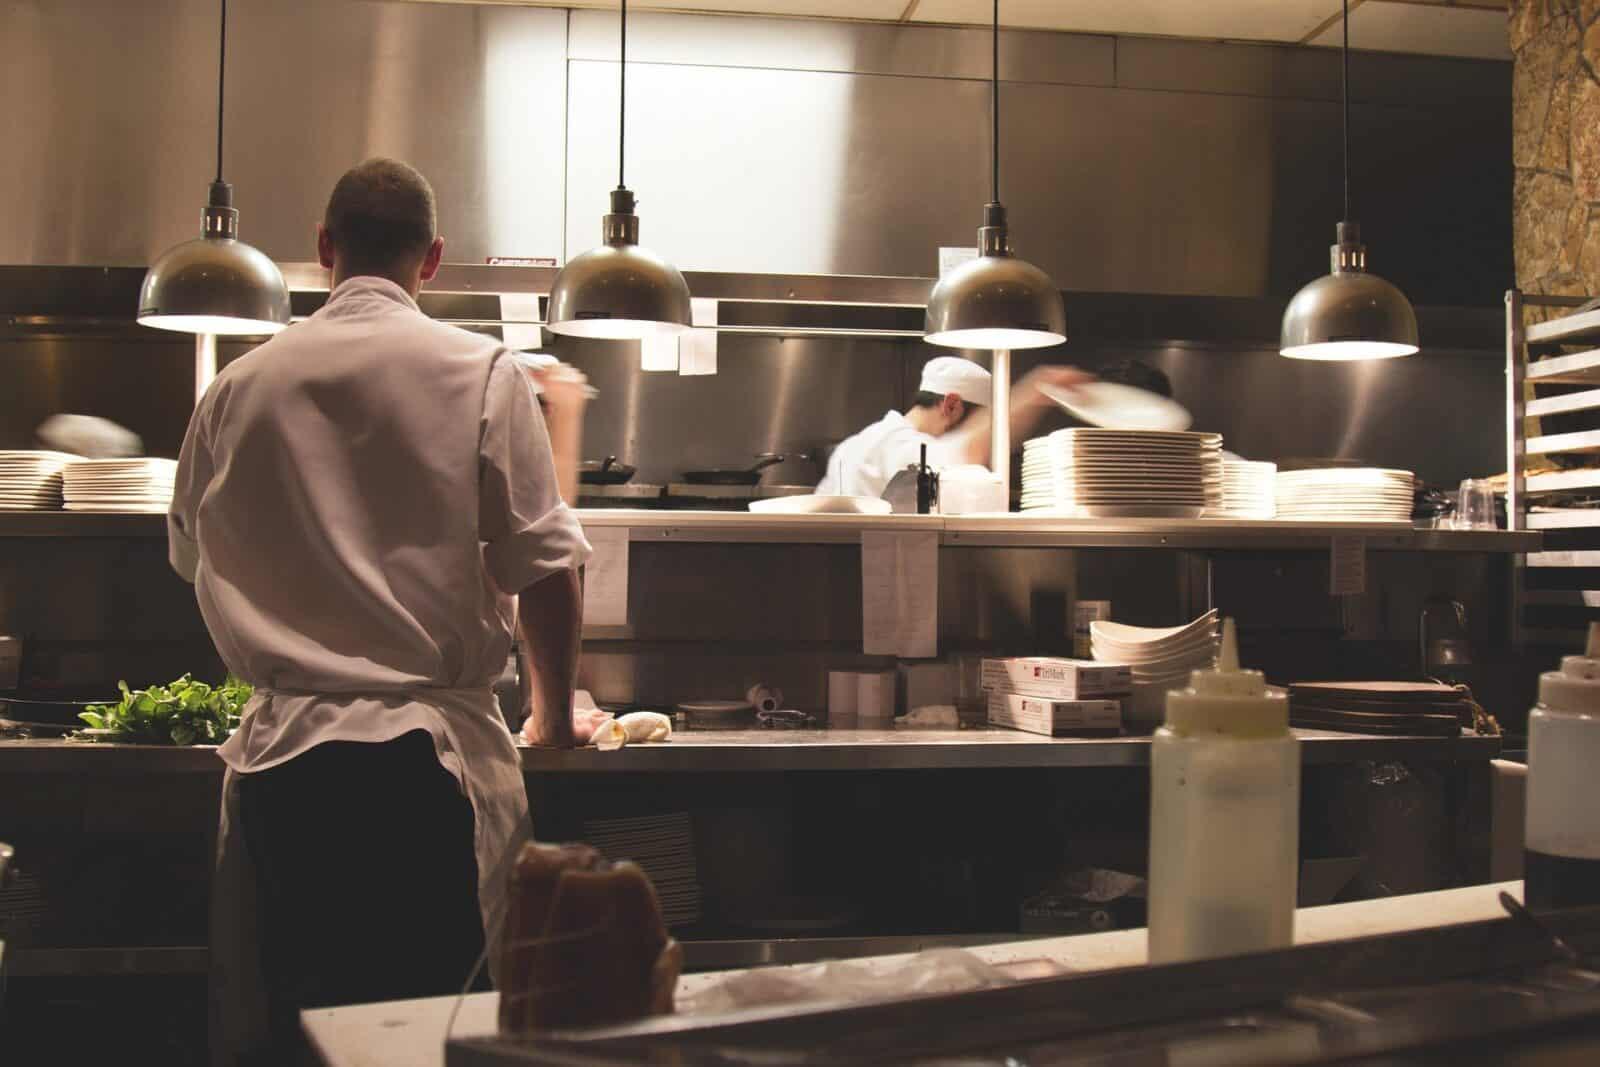 Sous chef working in a restaurant kitchen